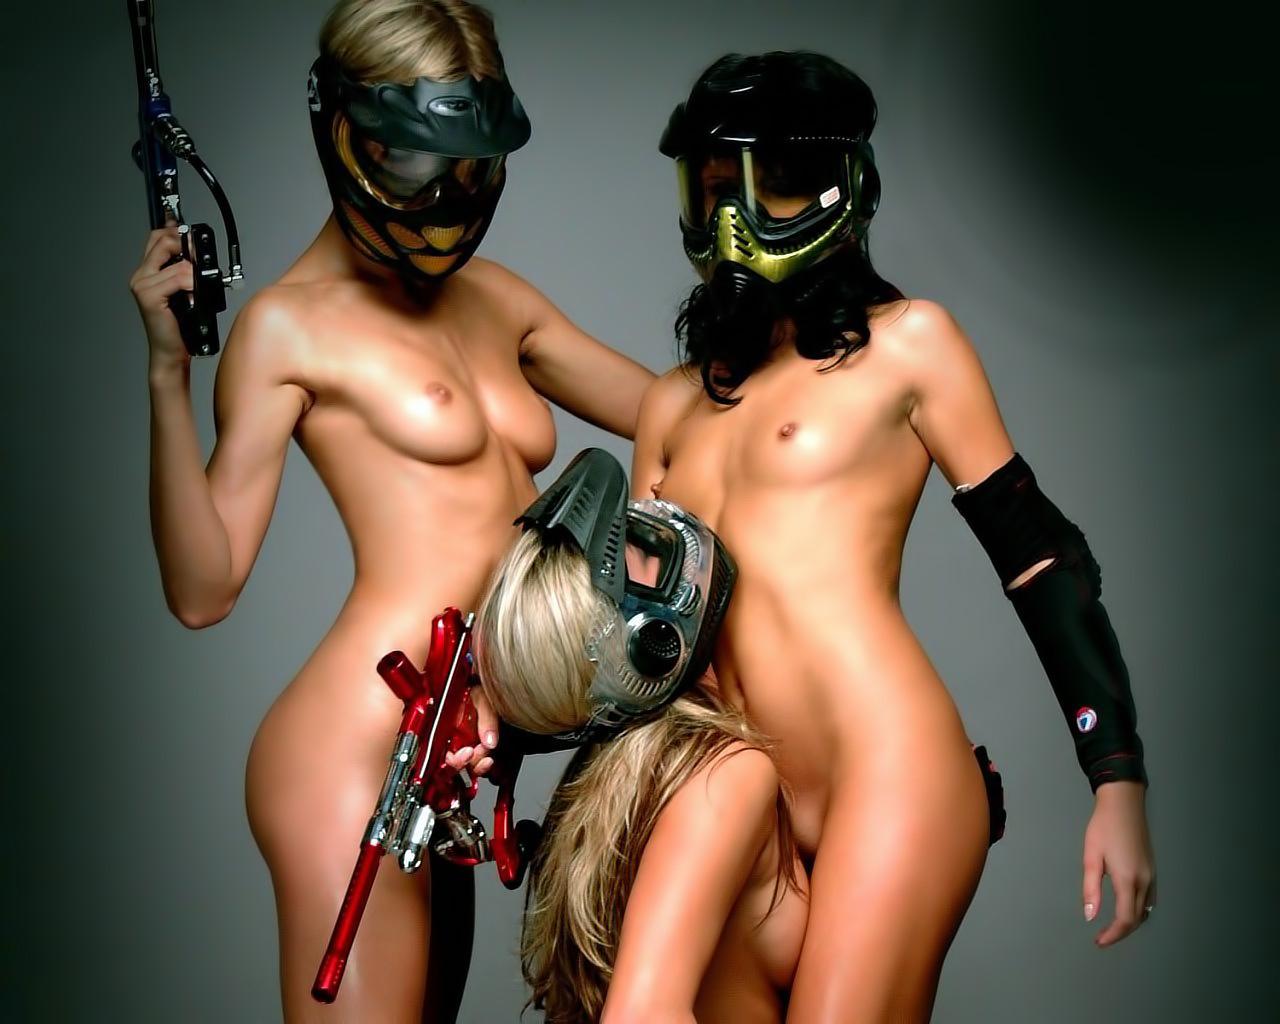 Italy teens virgin naked girls